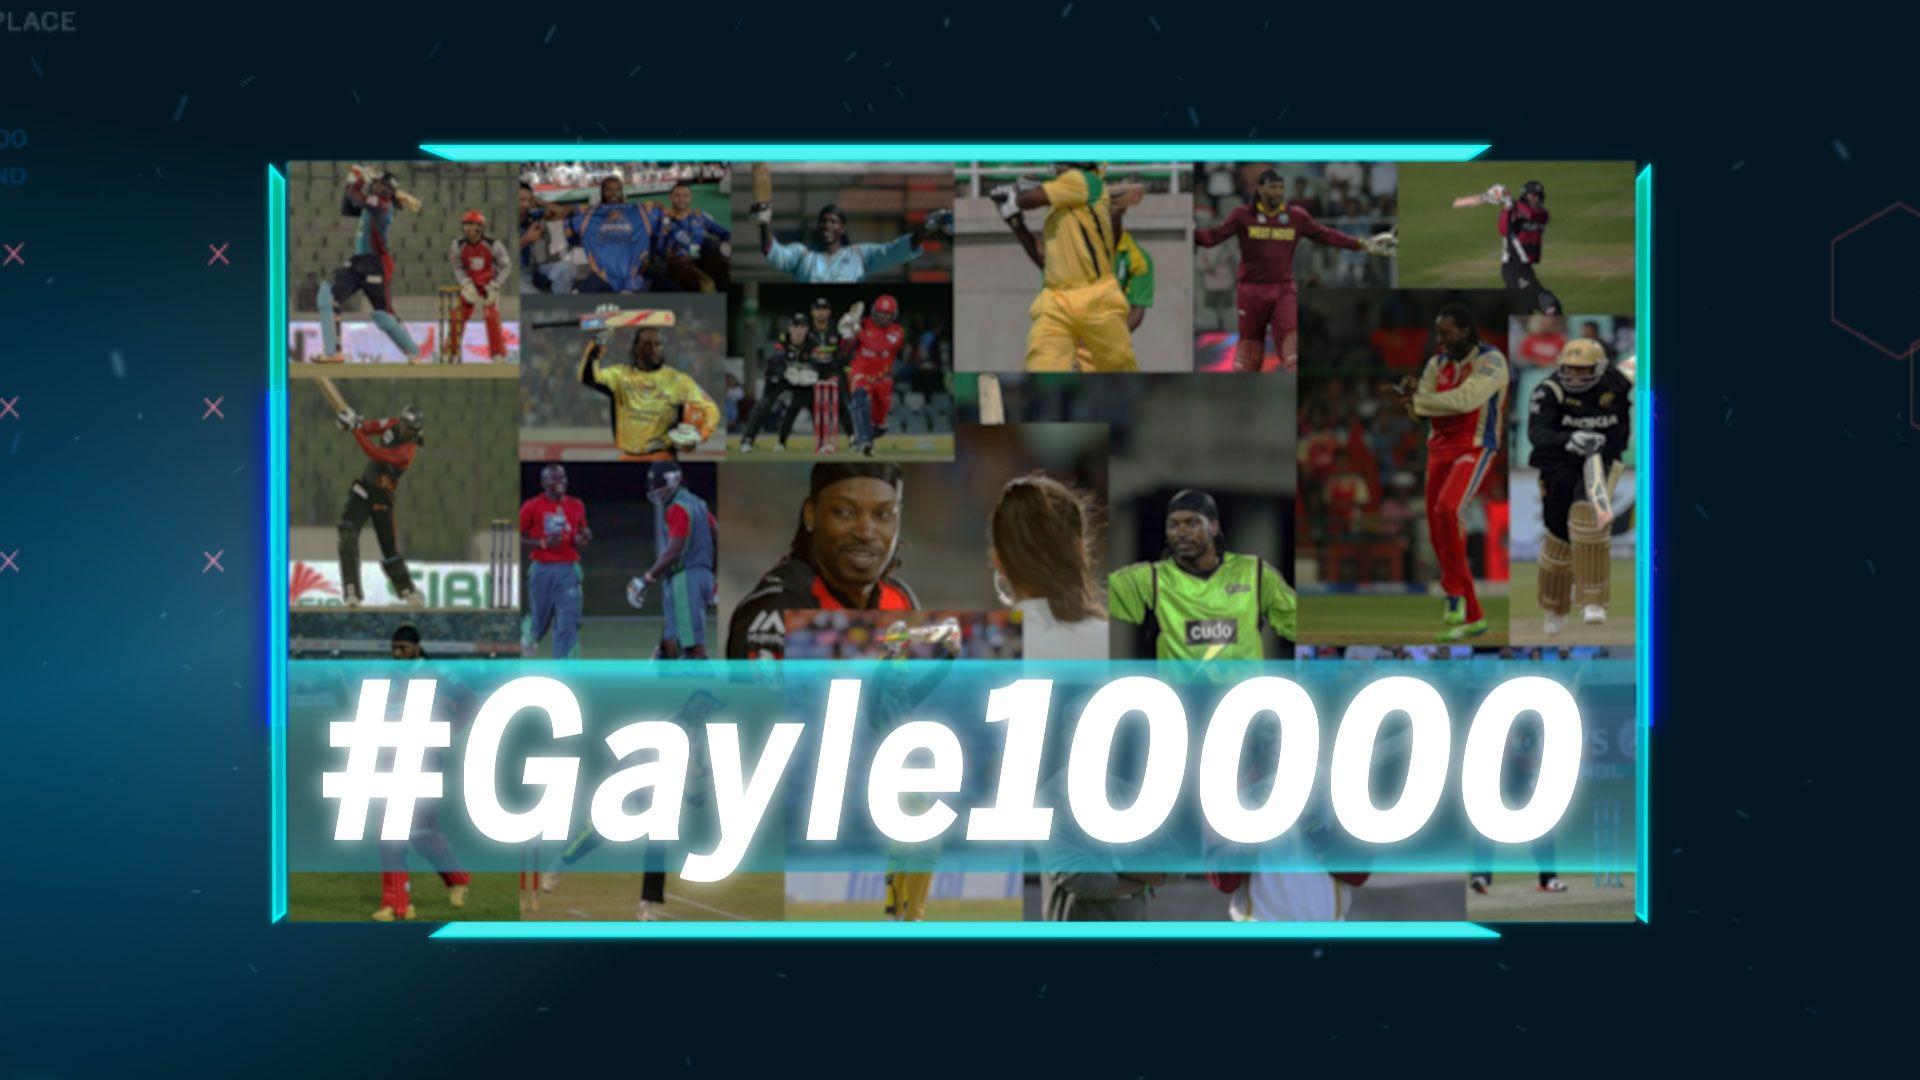 Gayle crosses 10,000-run mark in T20s - ESPN Video